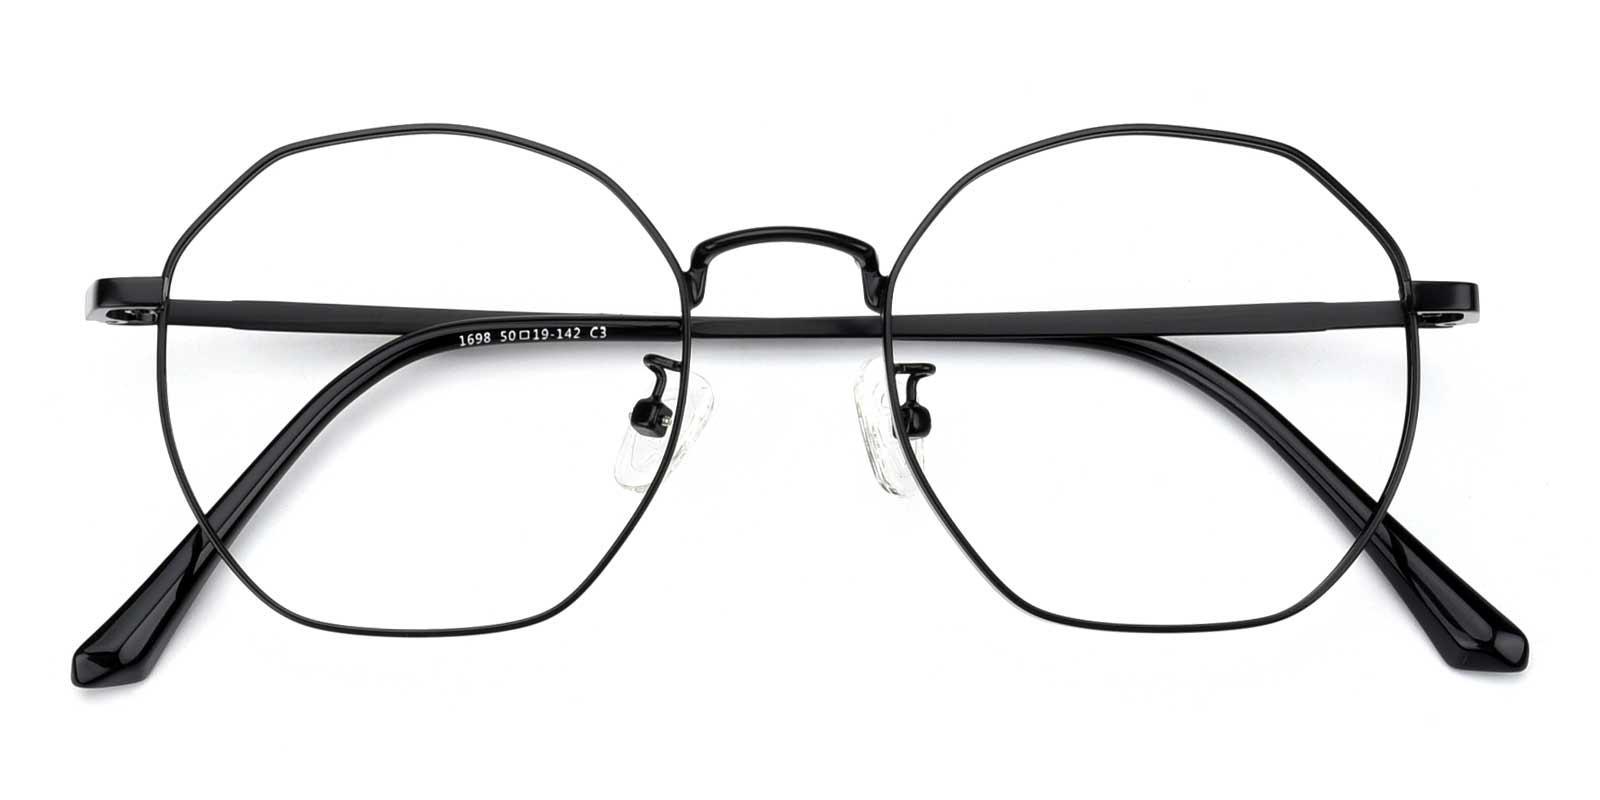 Loren-Black-Geometric-Metal-Eyeglasses-detail